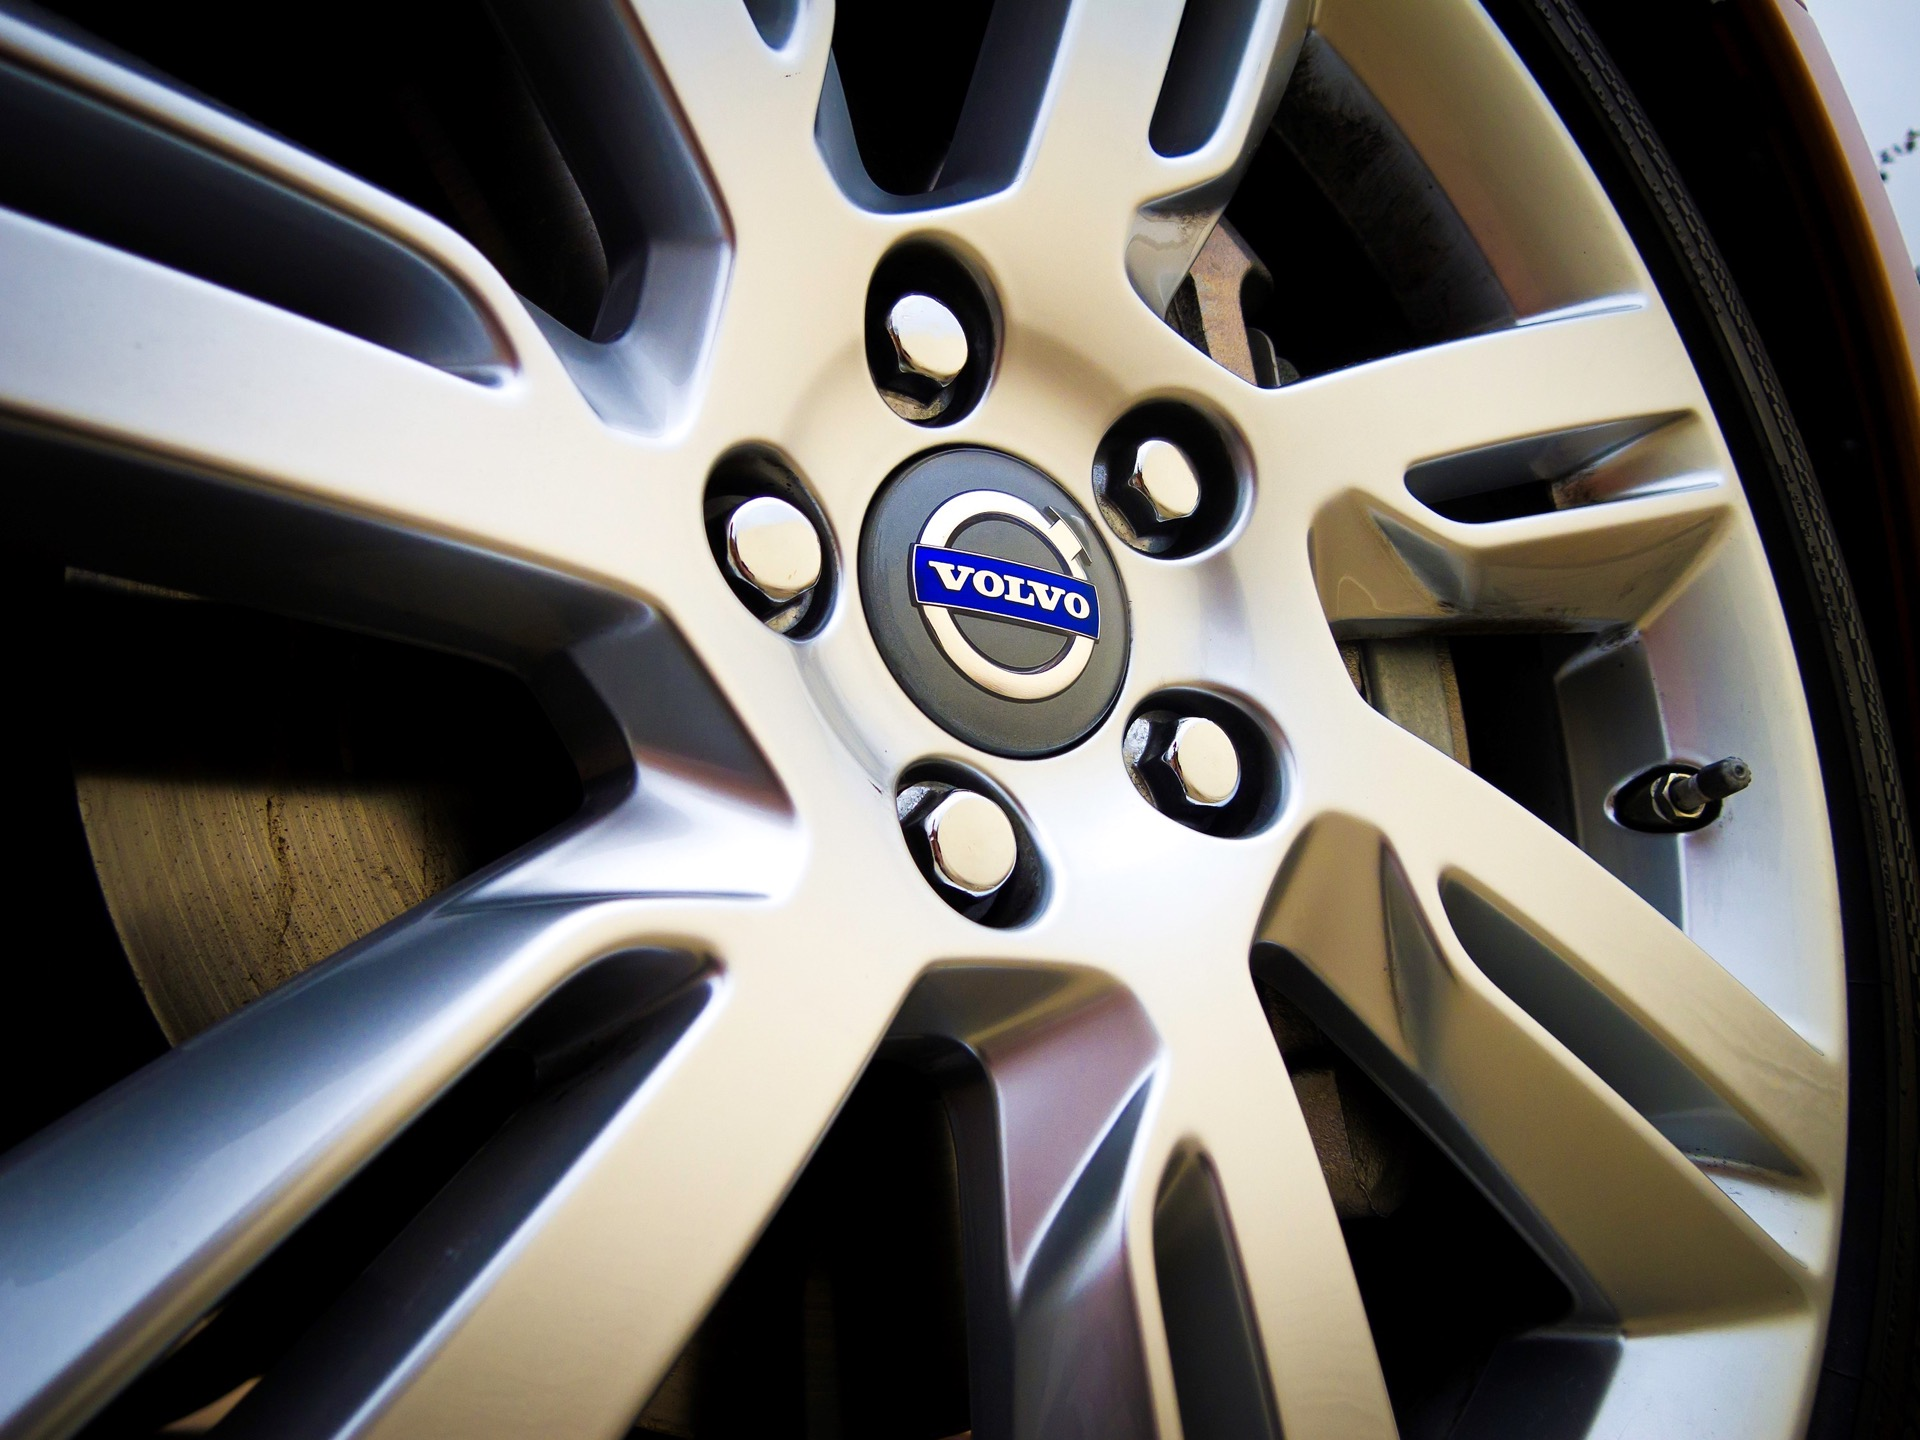 S60 T6 Awd Wheel -  Volvo